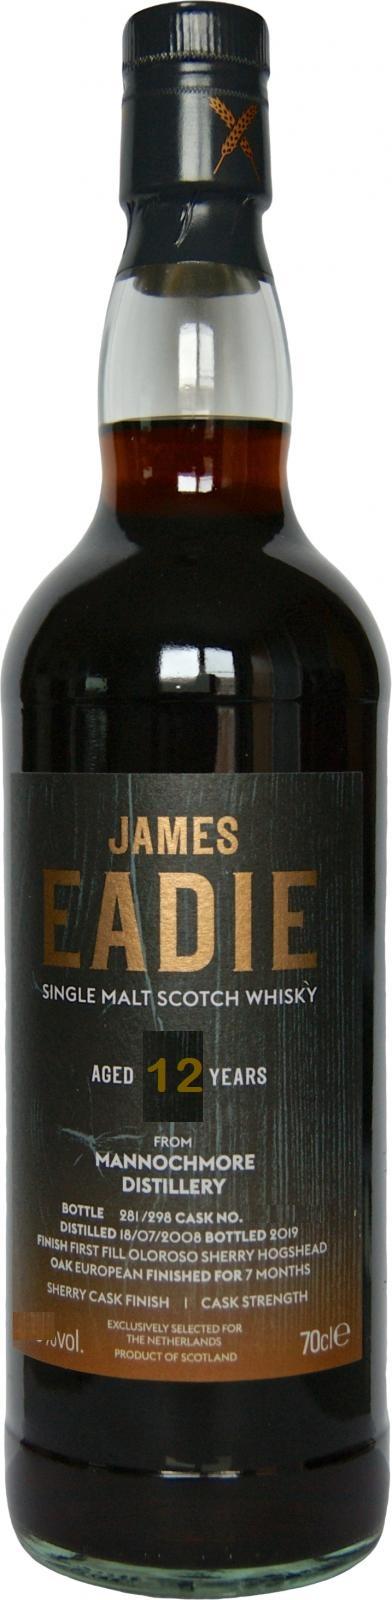 Mannochmore 12 yrs James Eadie